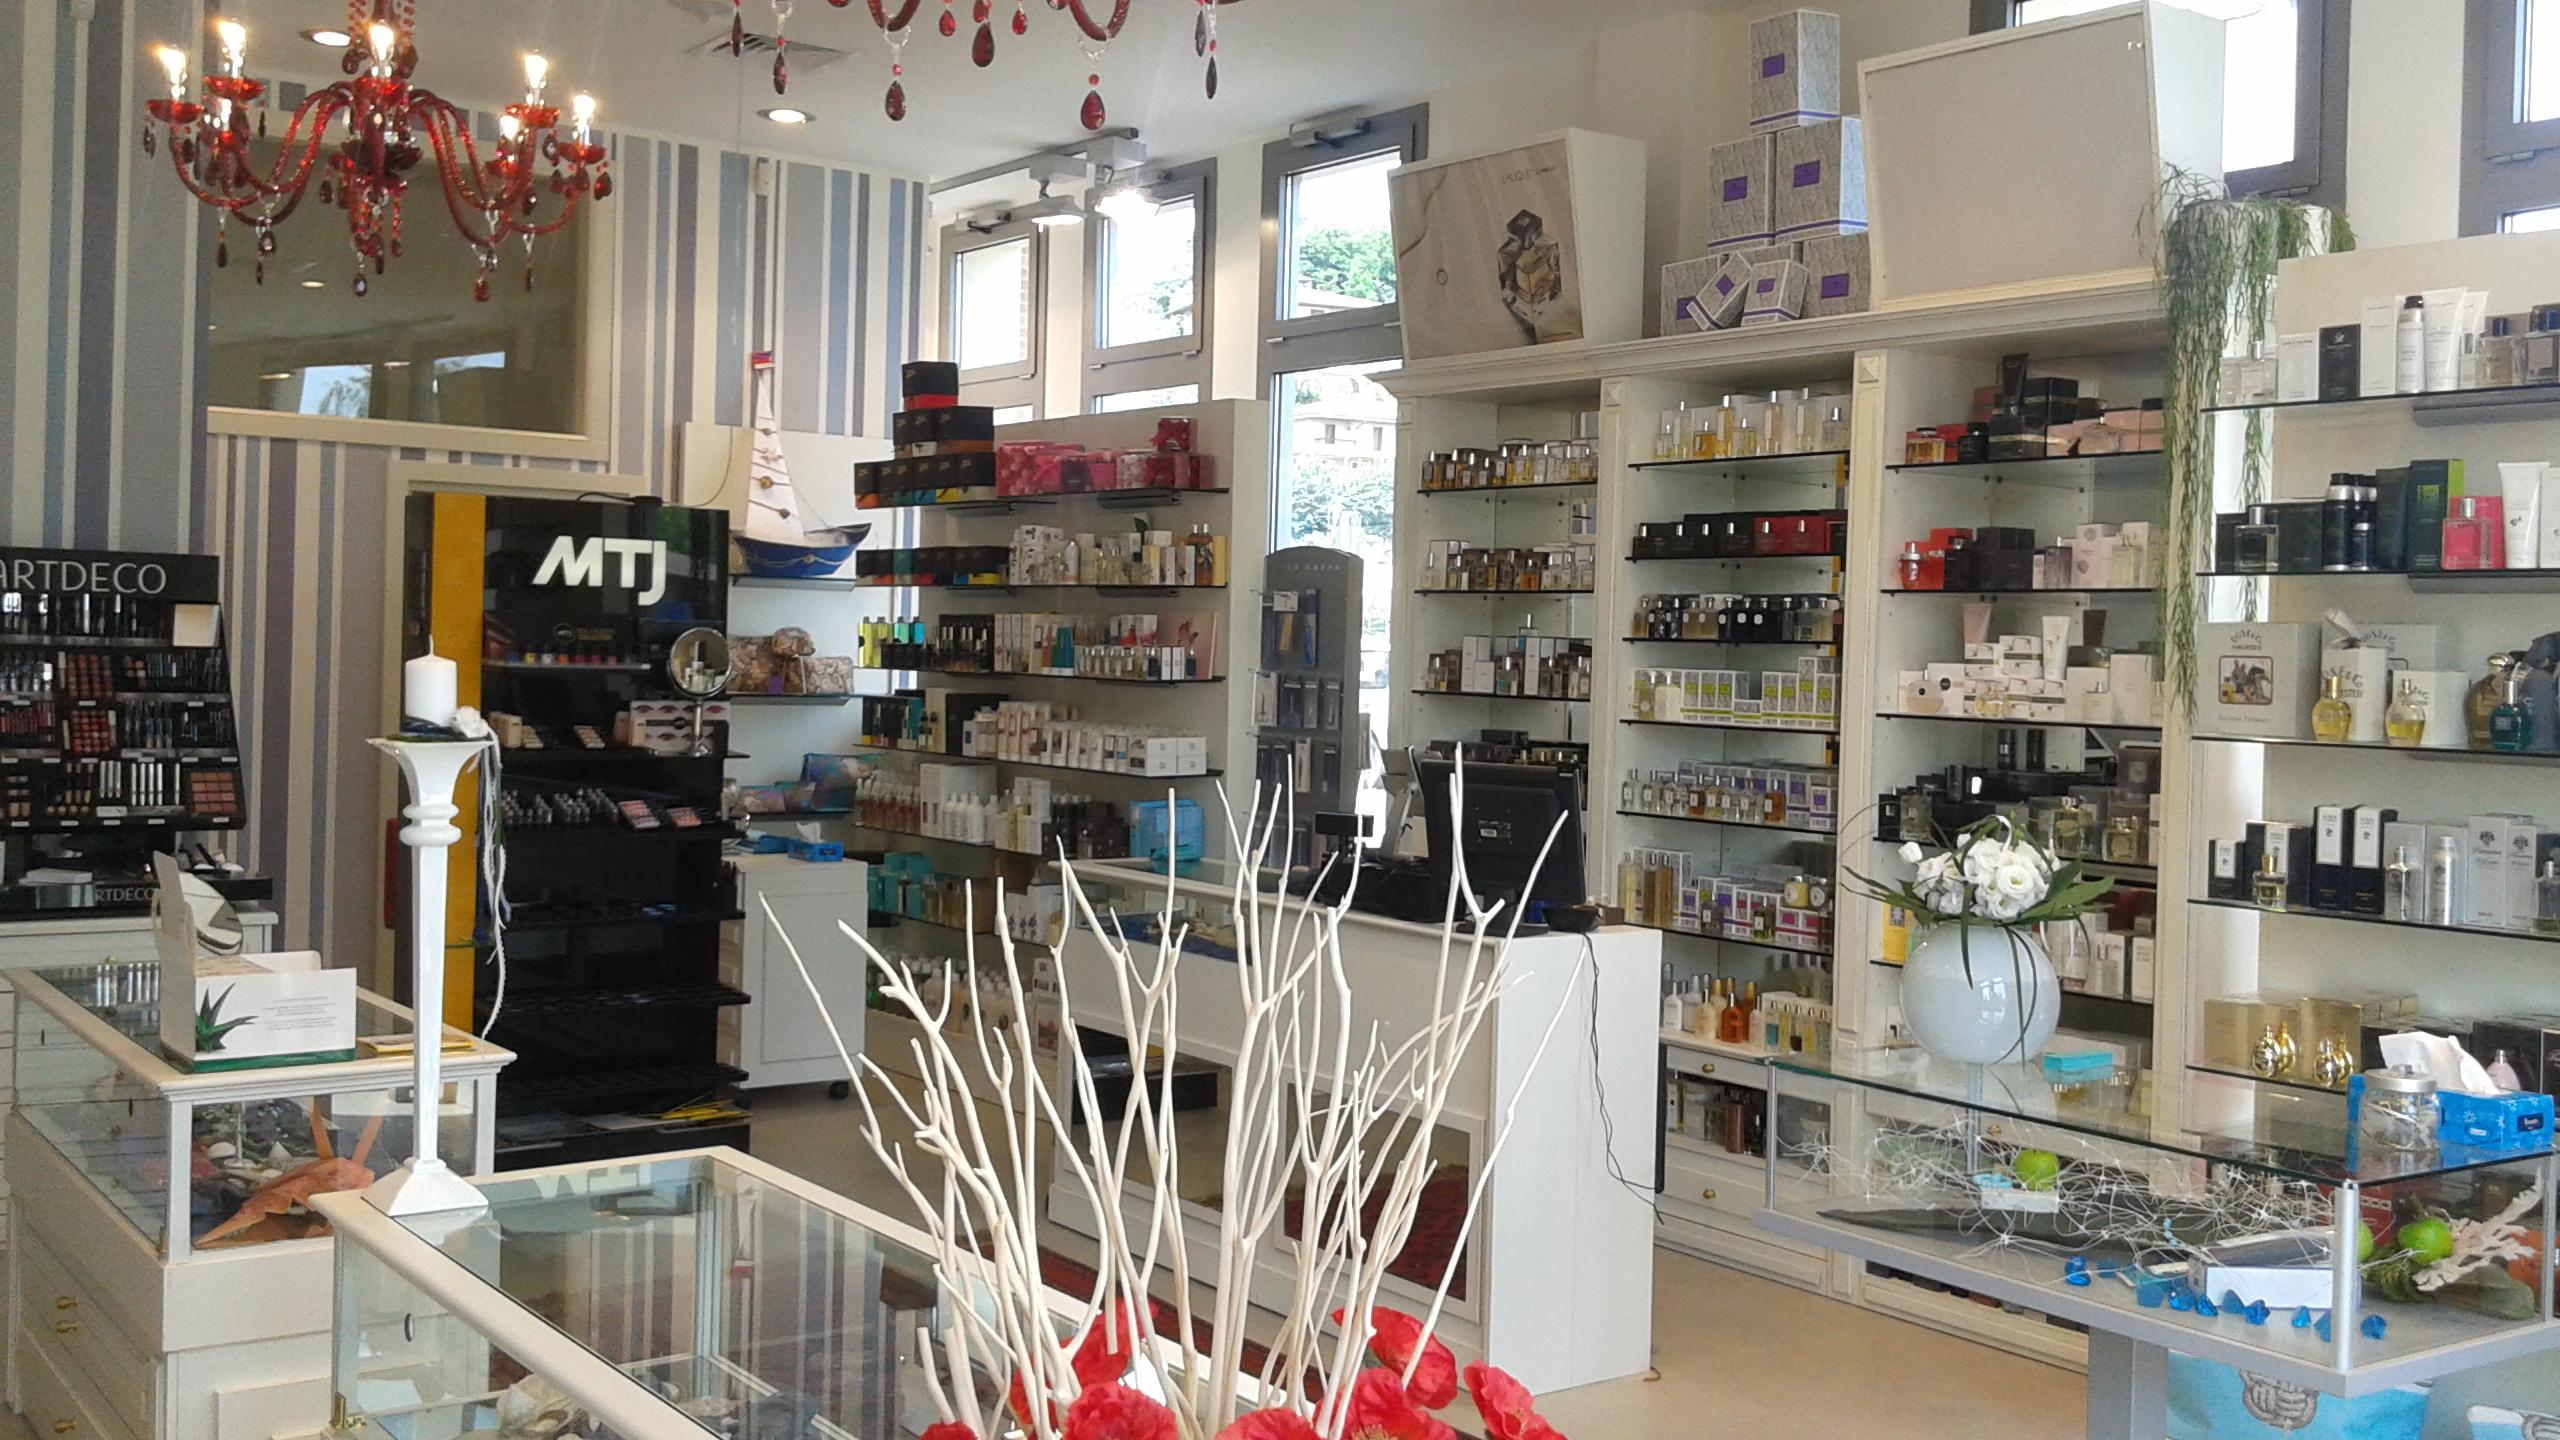 Arredamento per negozi ar design arredamentiar design for Negozi arredamento